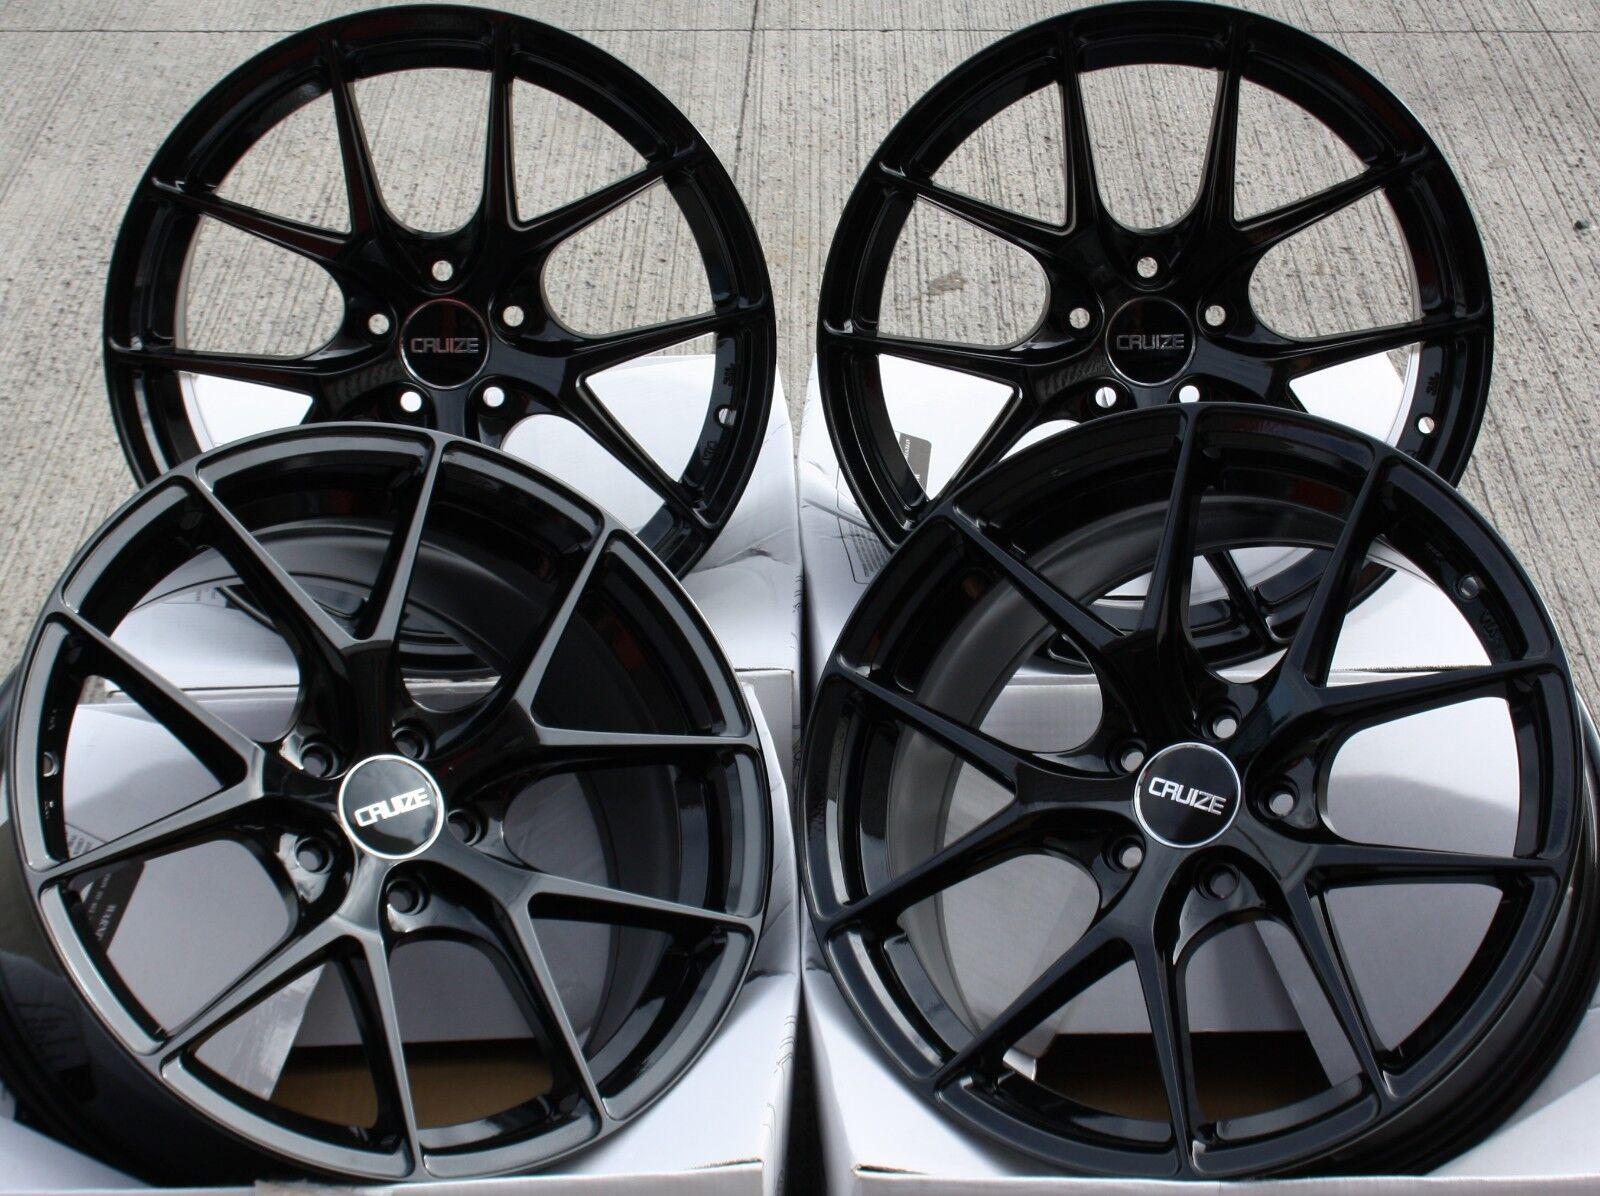 Alufelgen 18   Glanz black Gto für Vauxhall Astra Corsa Signum Vectra Zafira